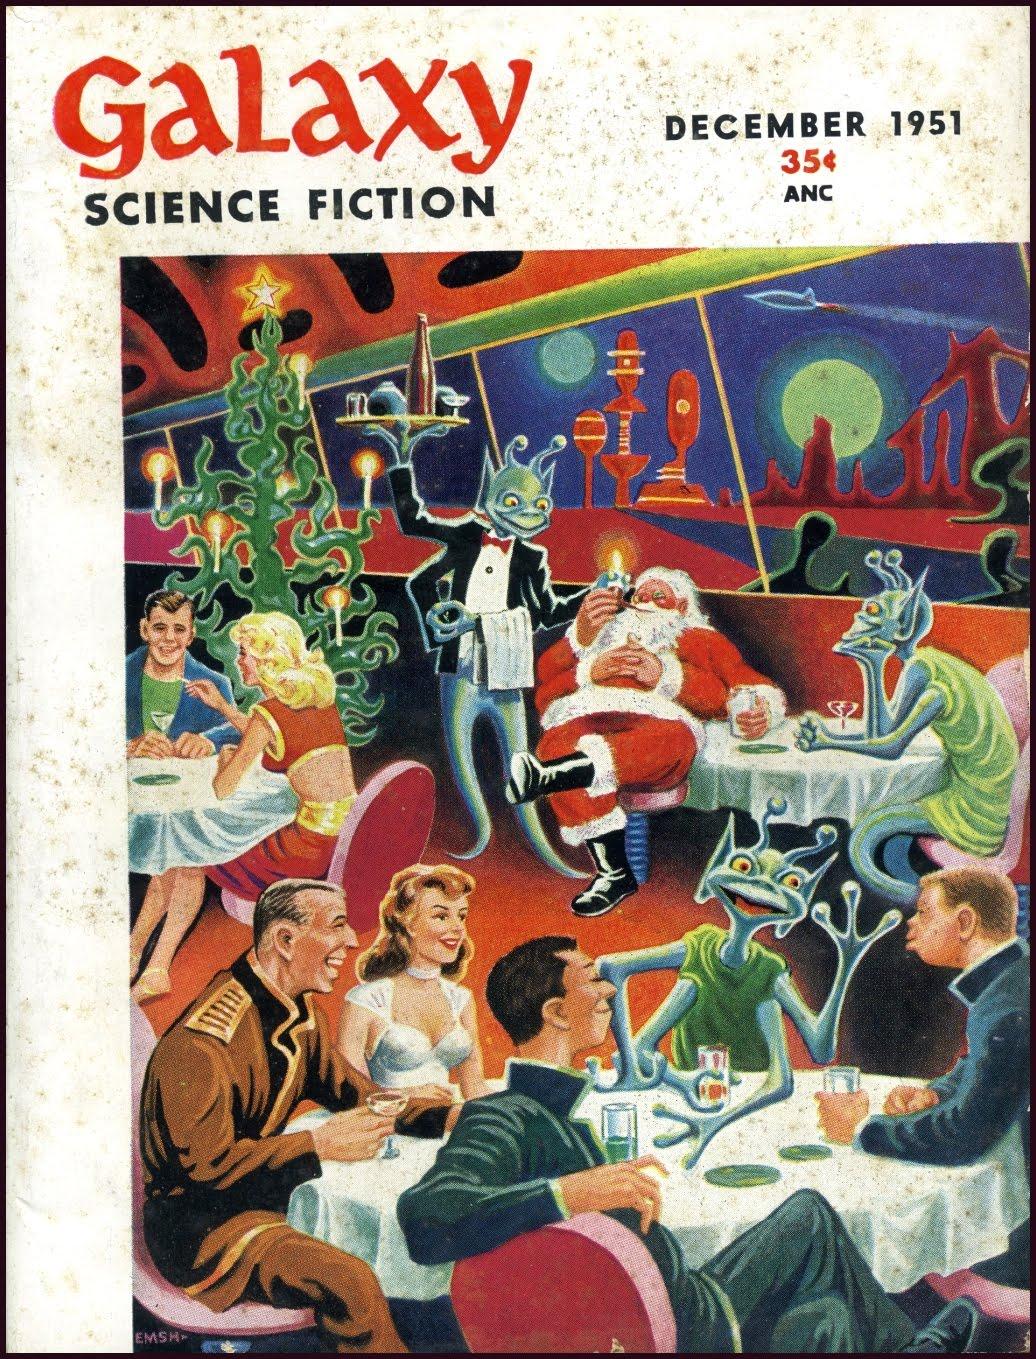 Galaxy - научно-фантастический журнал